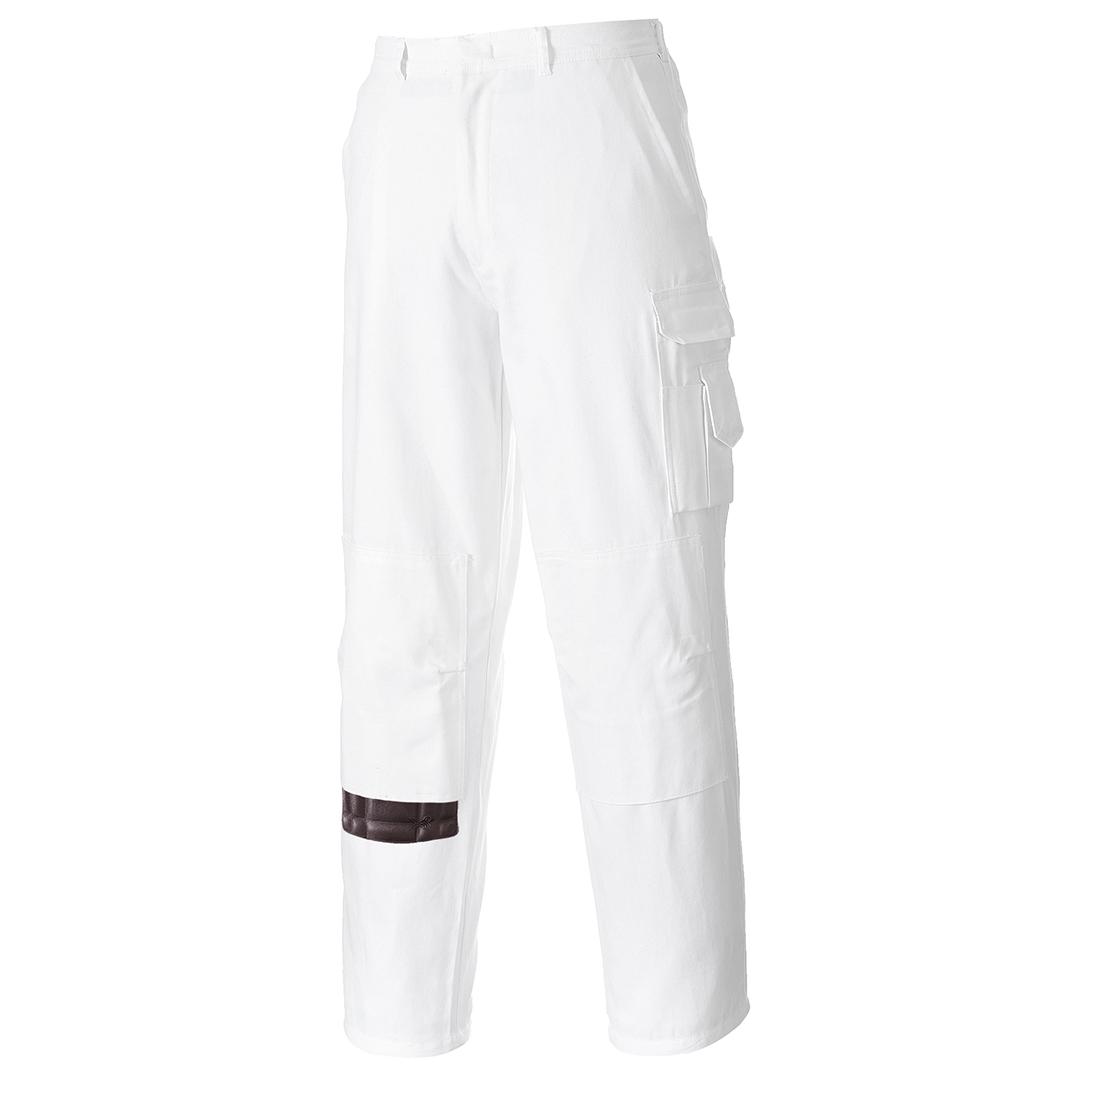 Painters Trousers White XXXLR